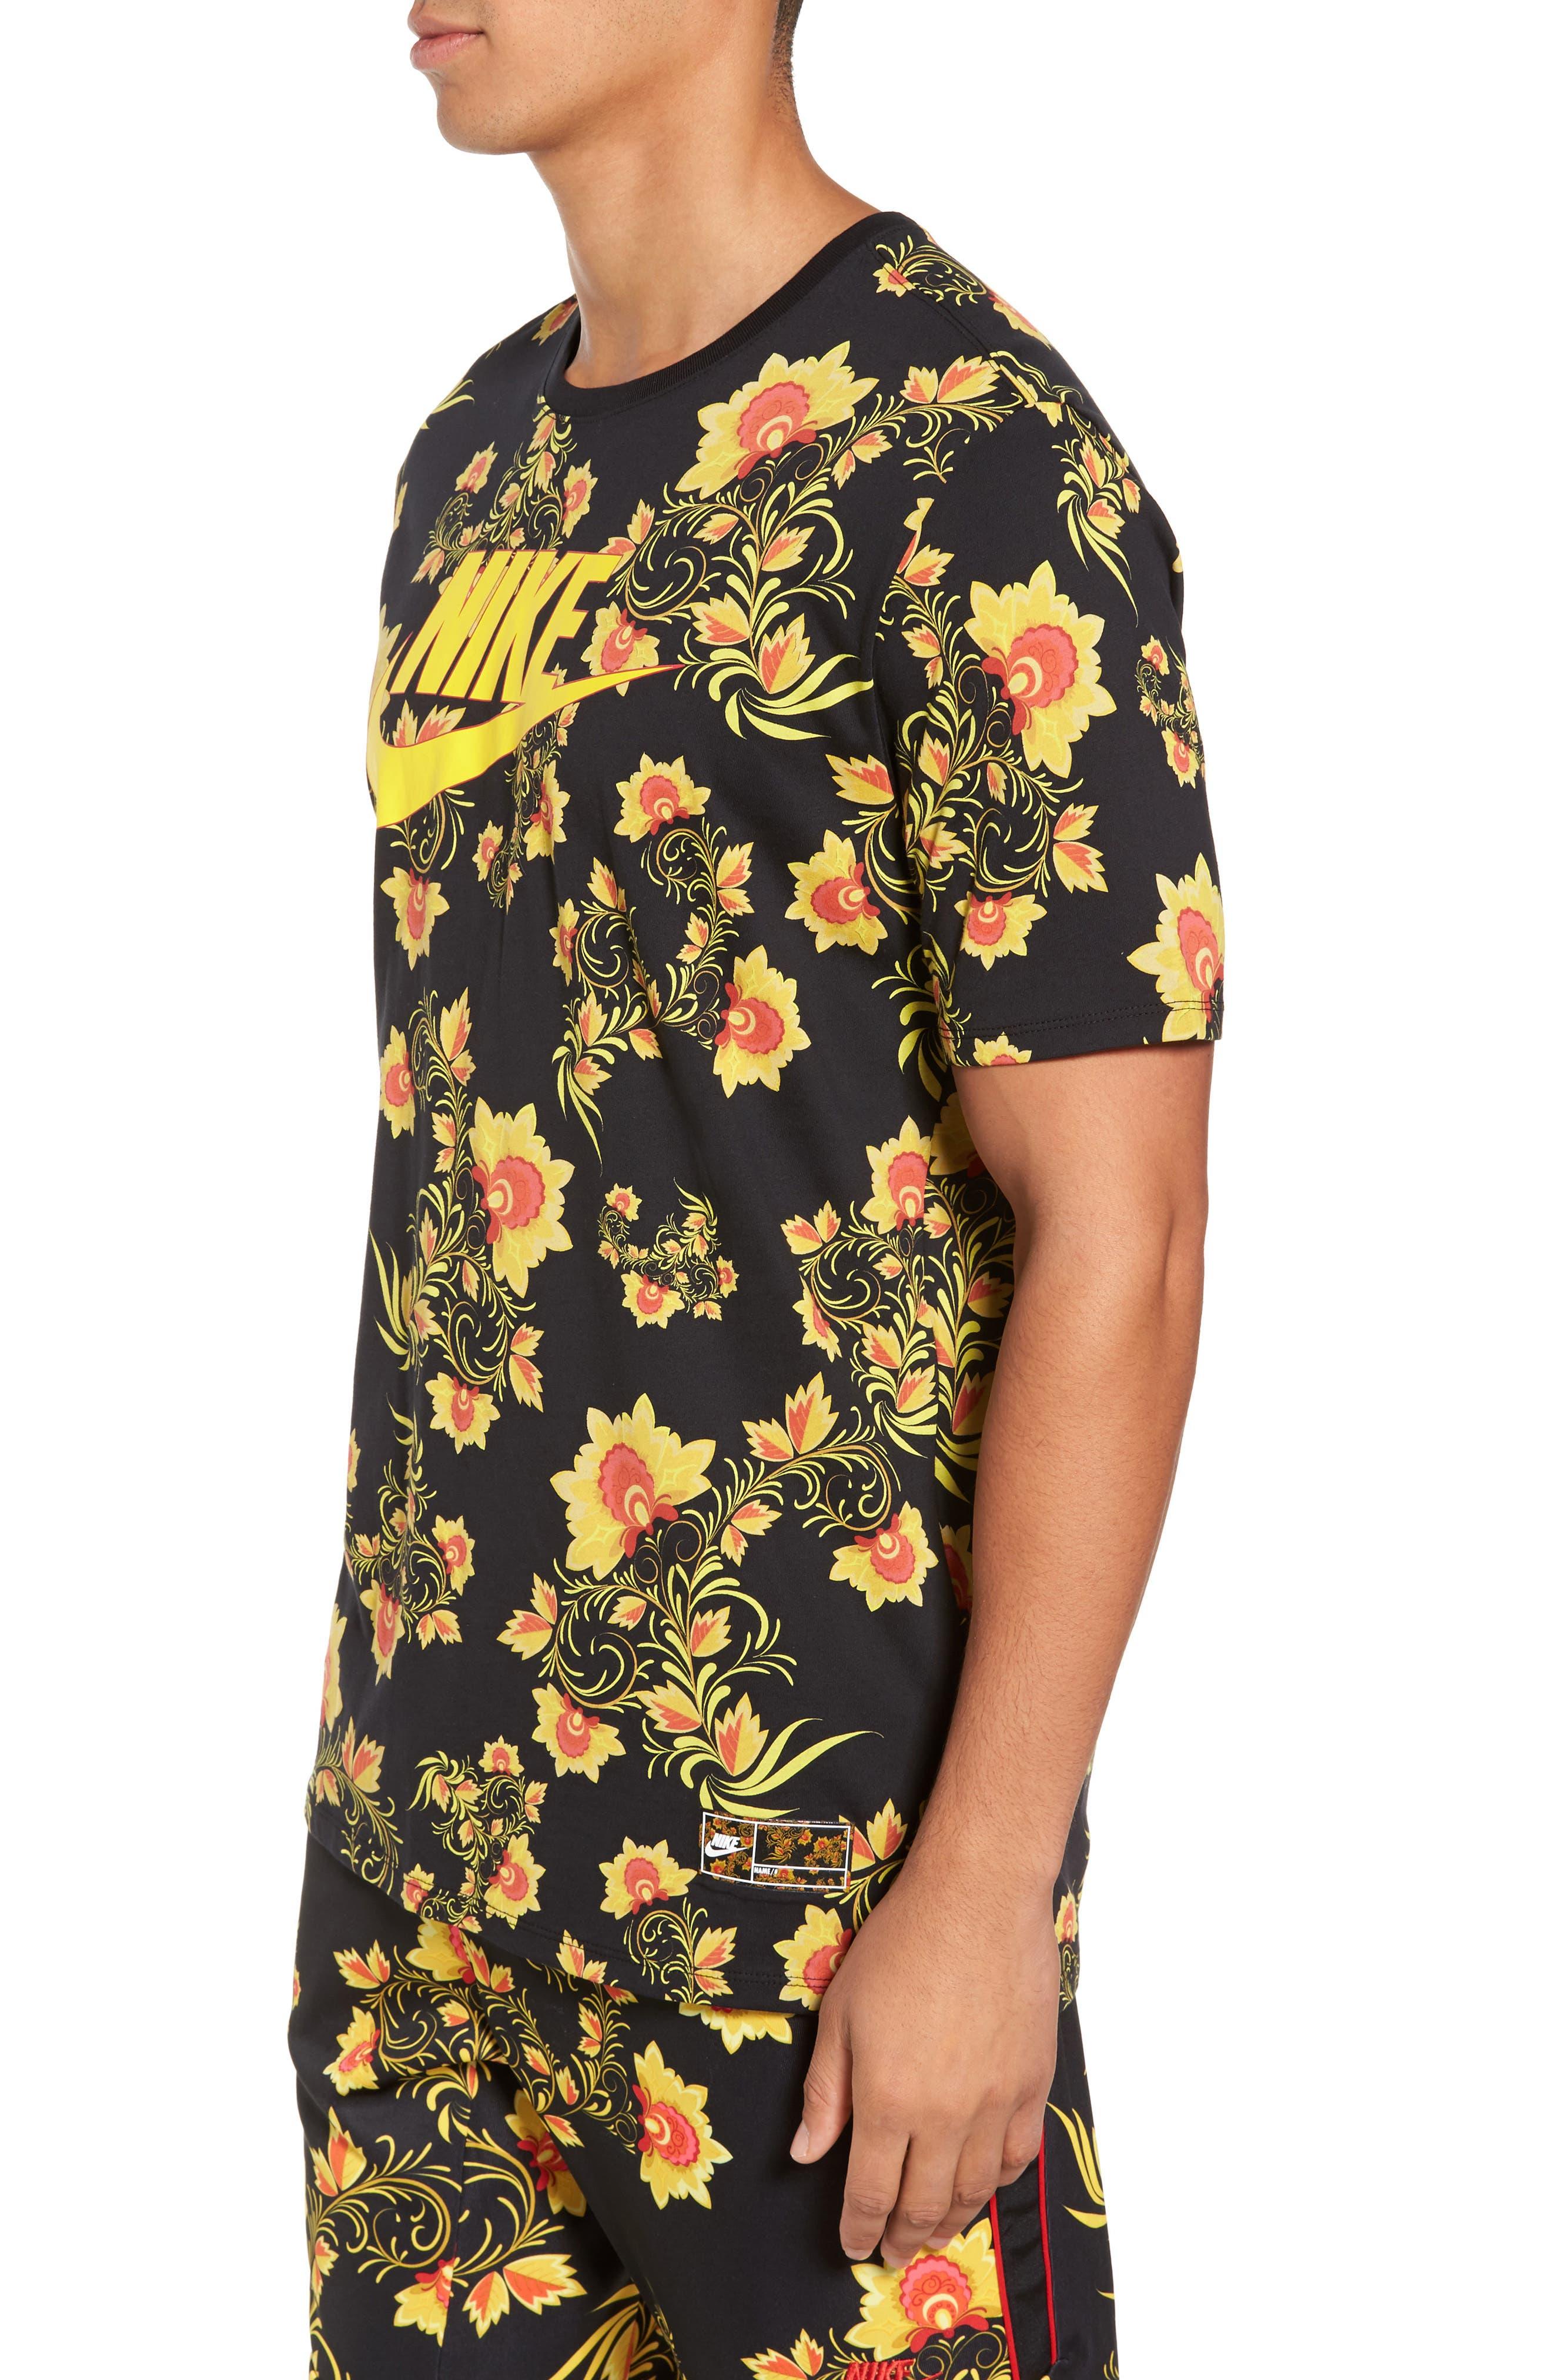 NSW Concept T-Shirt,                             Alternate thumbnail 3, color,                             Black/ Tour Yellow